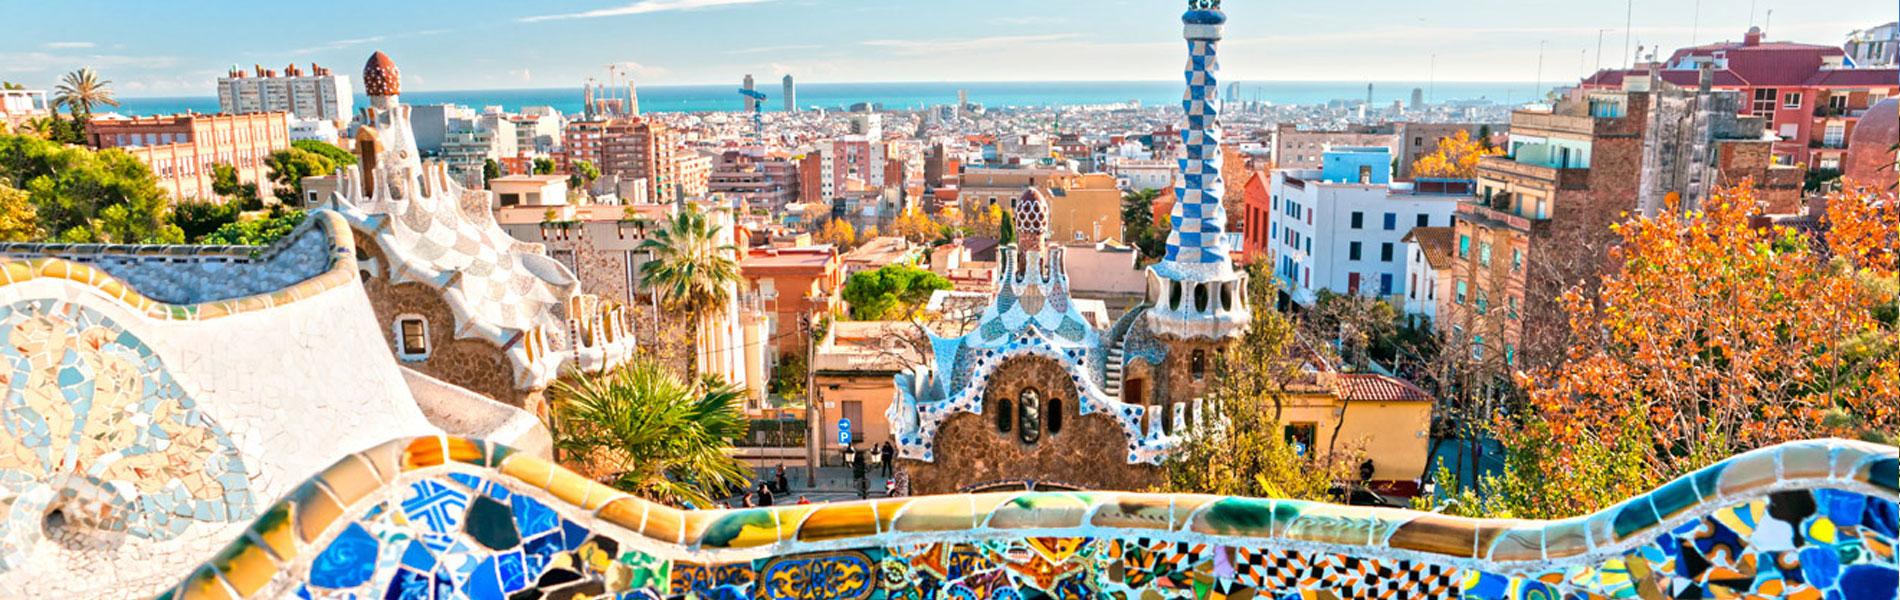 restaurante espectaculo barcelona